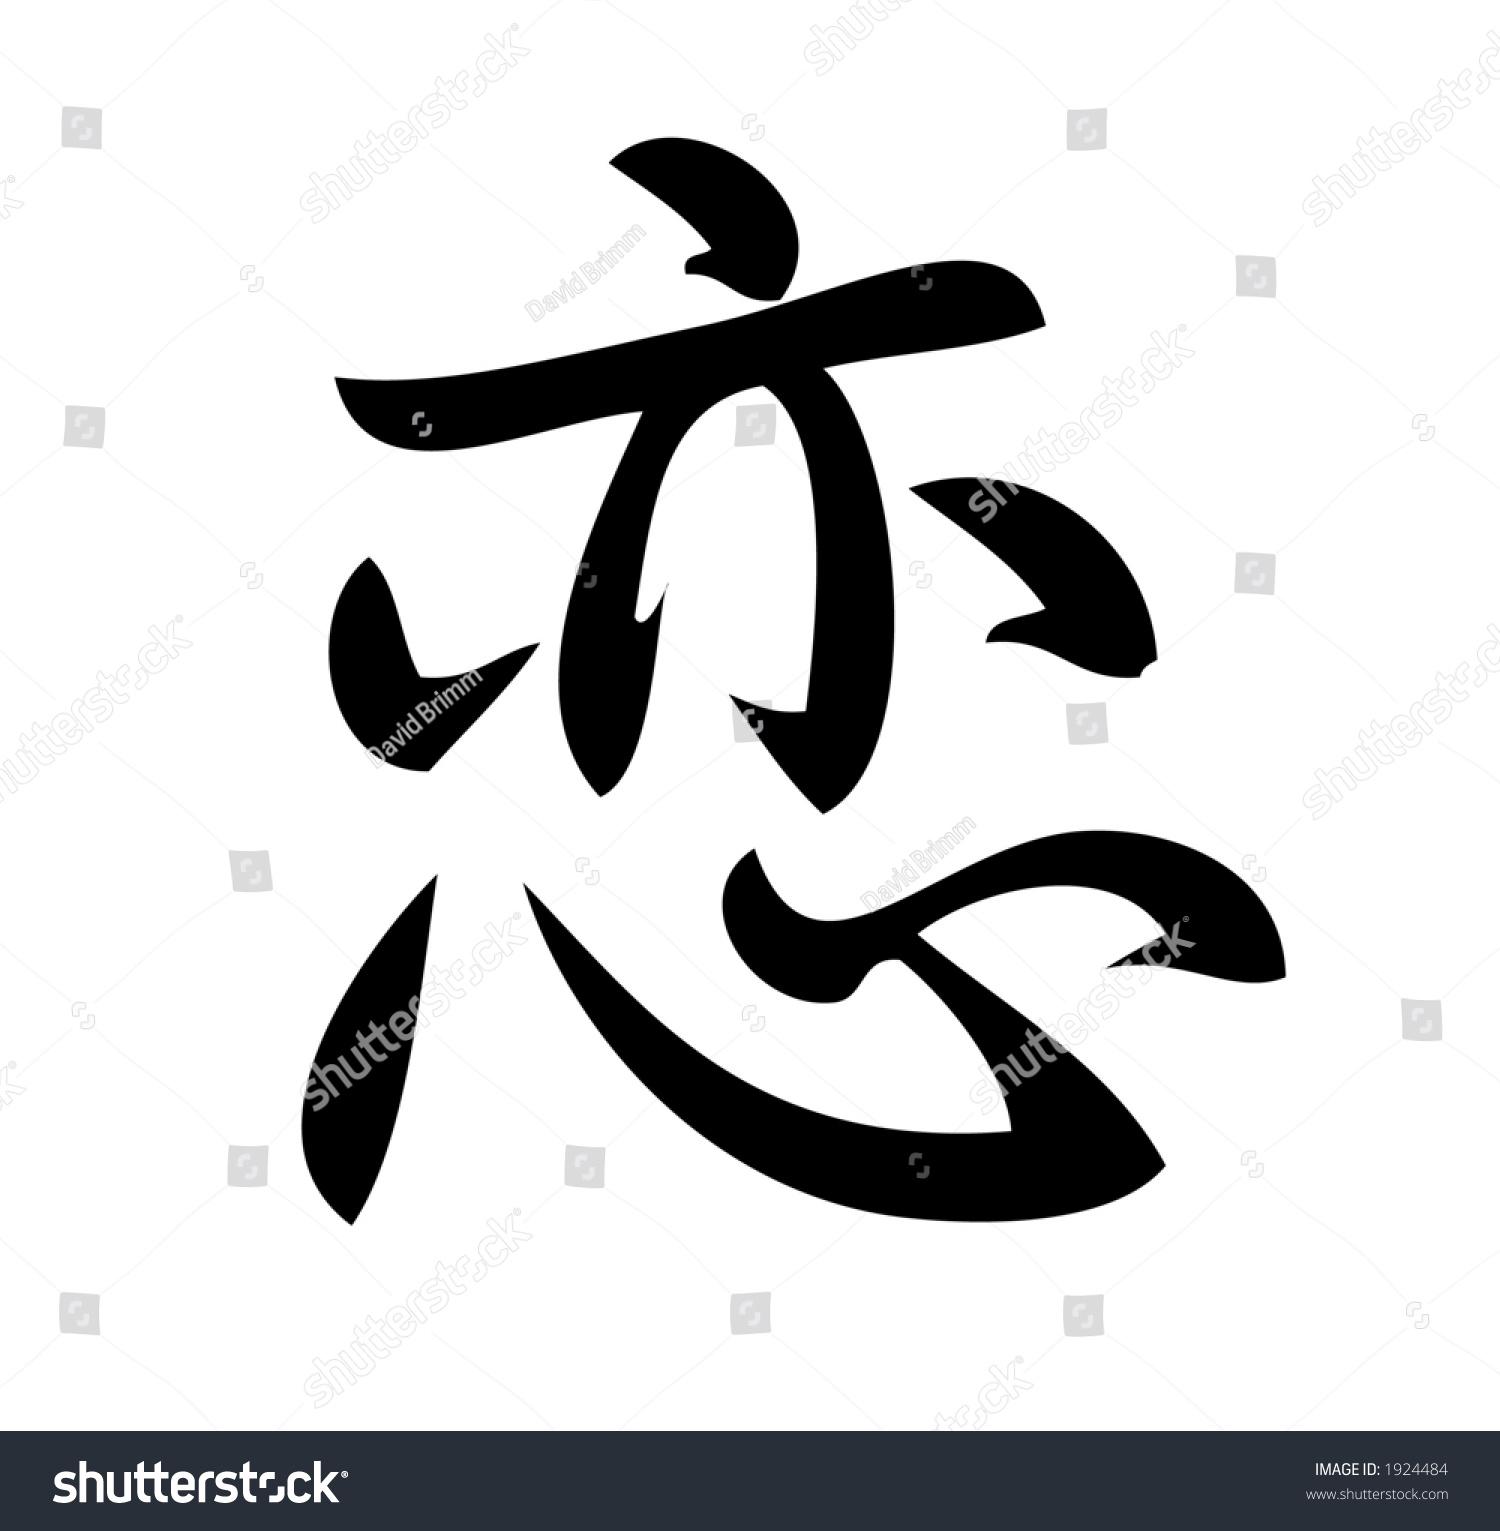 Kanji character love be love beloved stock illustration 1924484 kanji character for love be in love beloved kanji are chinese buycottarizona Images